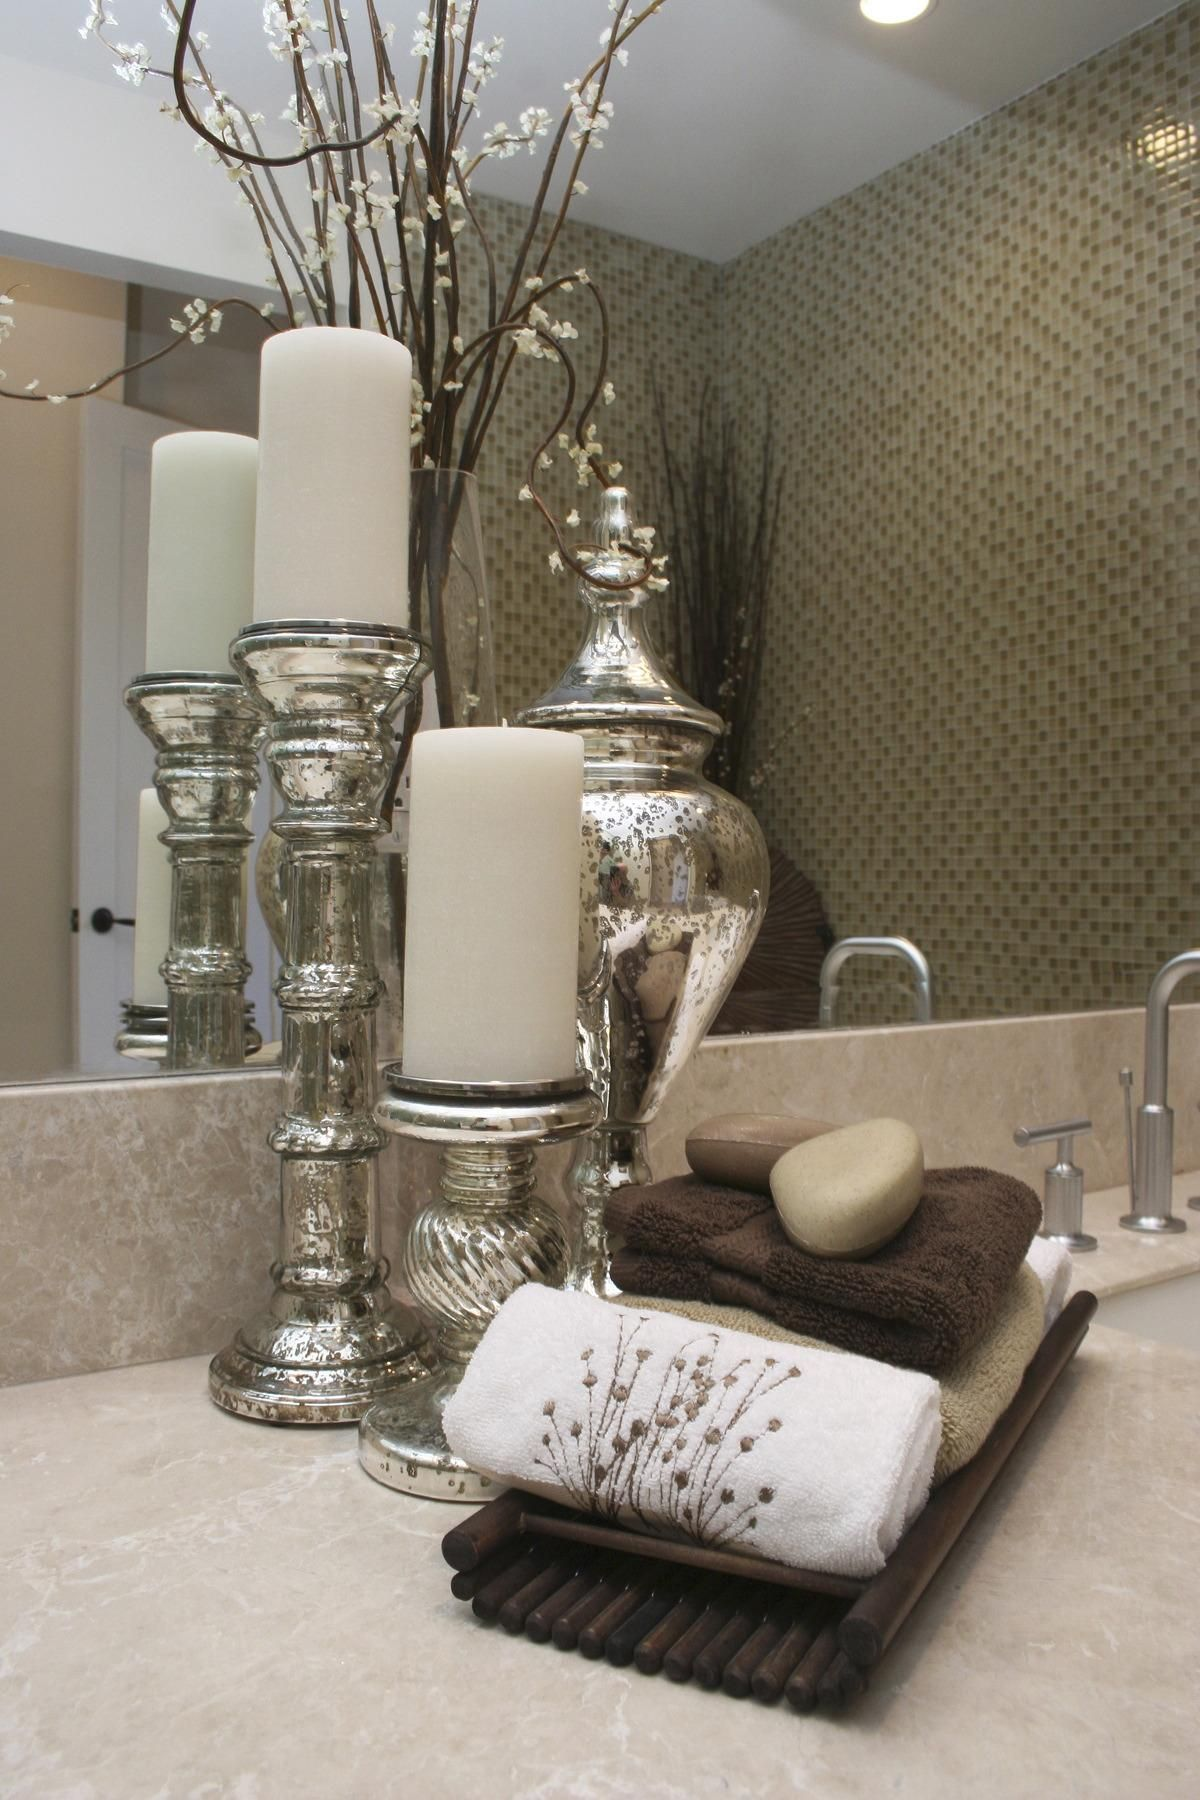 vanity decor | . m y b a t h r o o m s . | pinterest | vanity